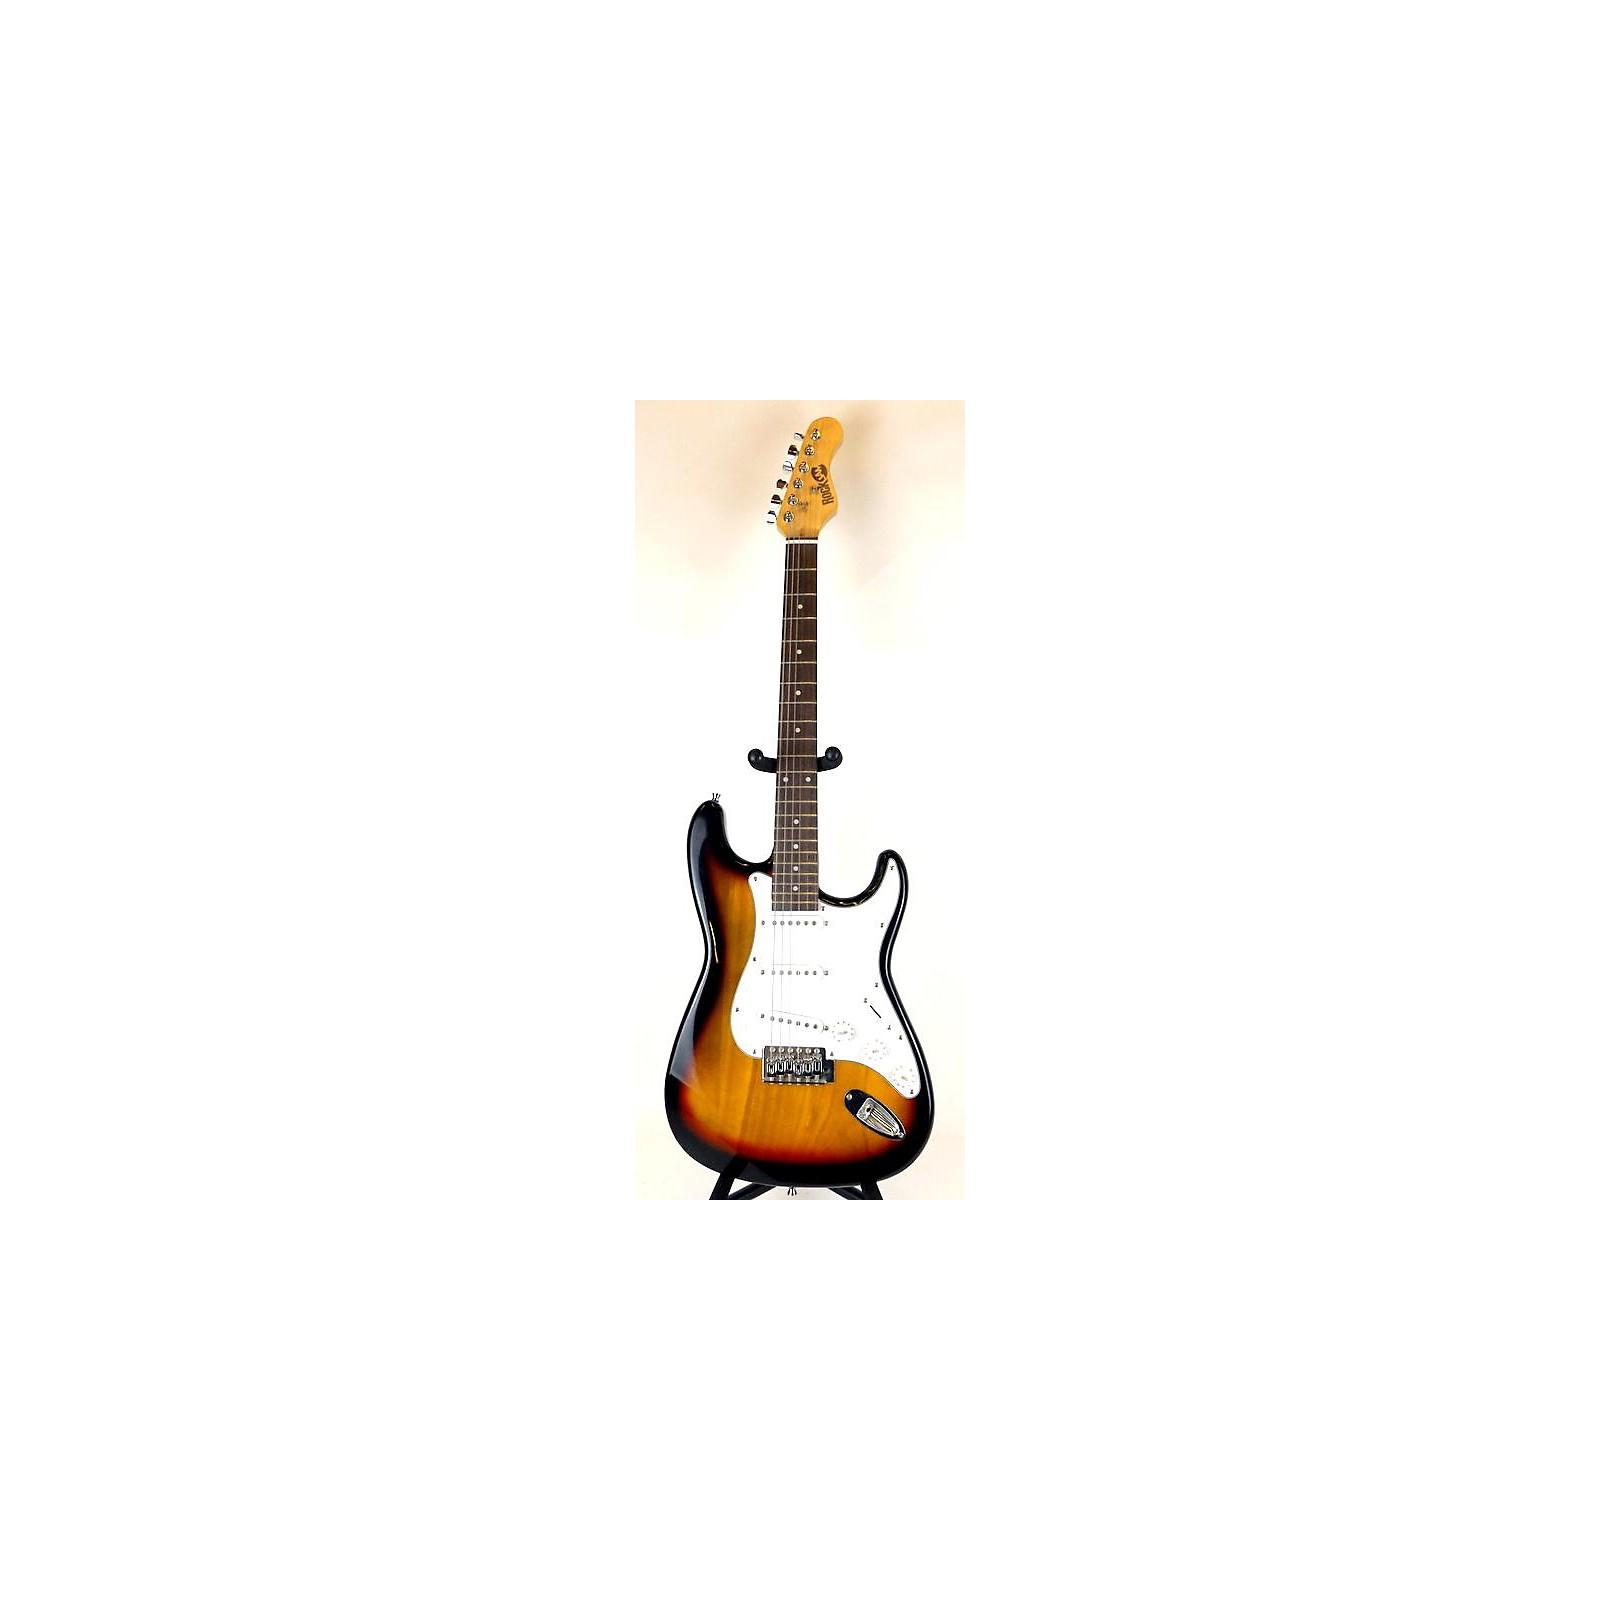 In Store Used Used Rock Jam Rock Jam 6 Sunburst Solid Body Electric Guitar